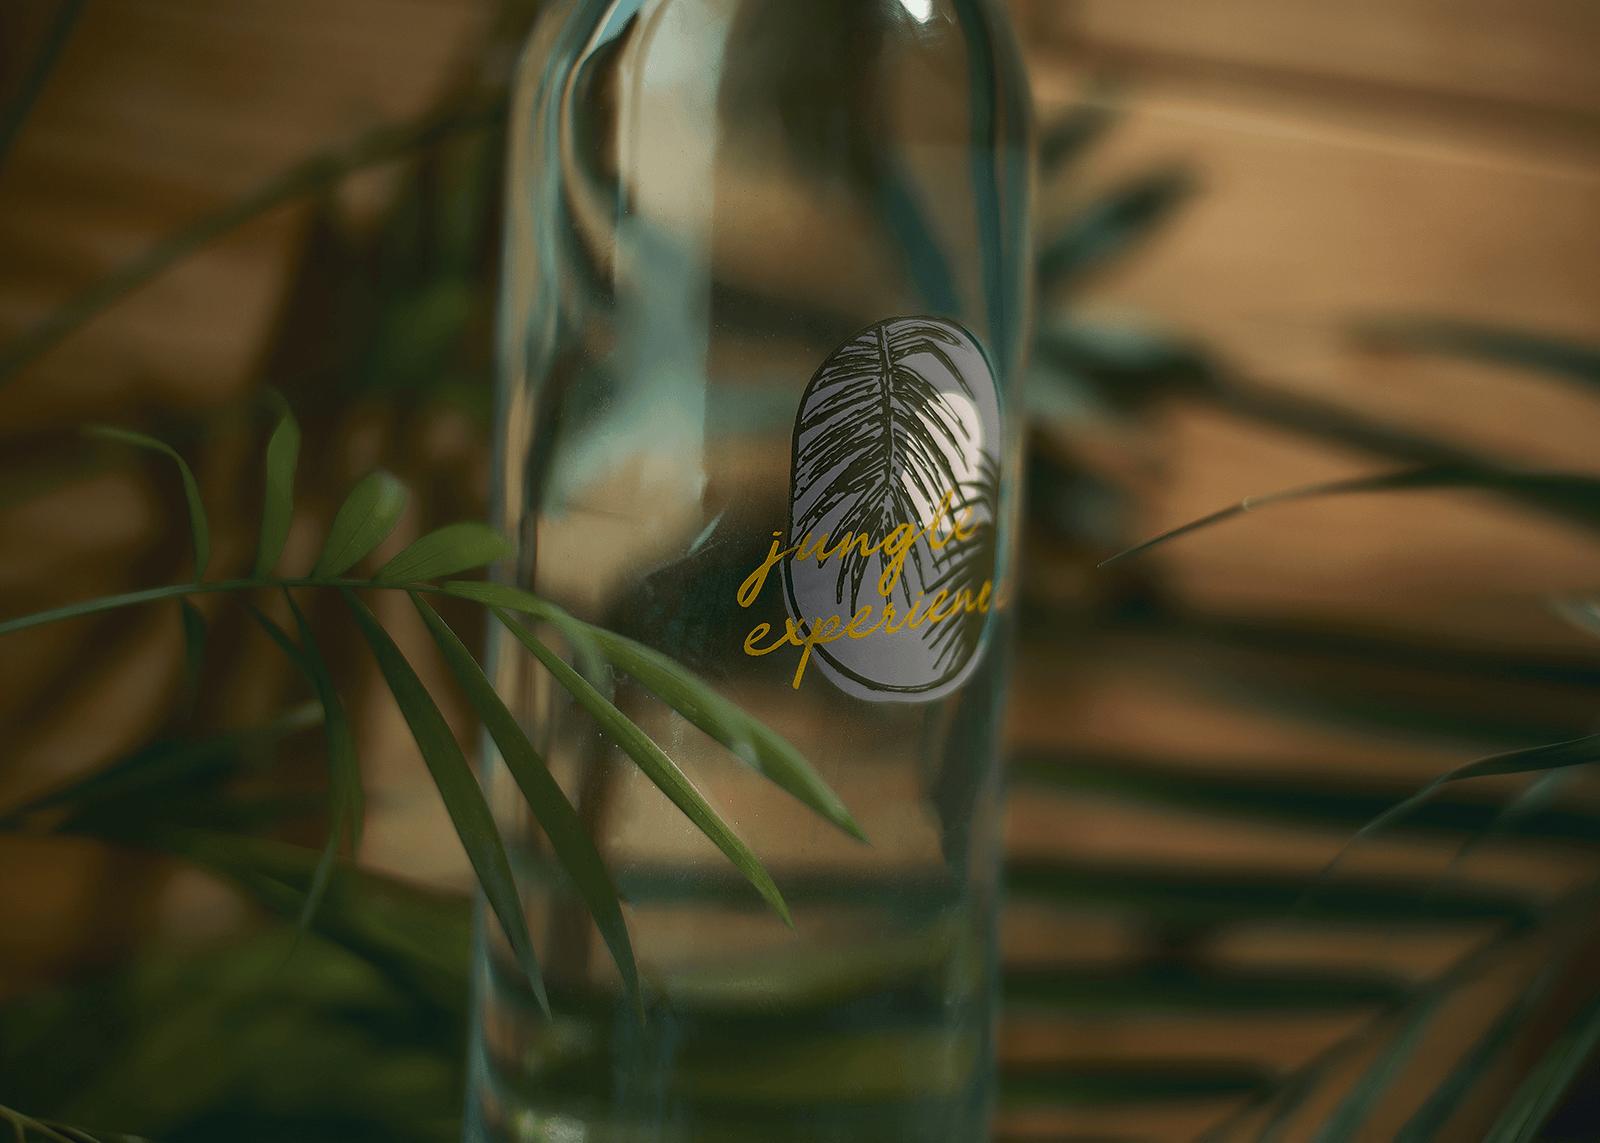 branding-estela